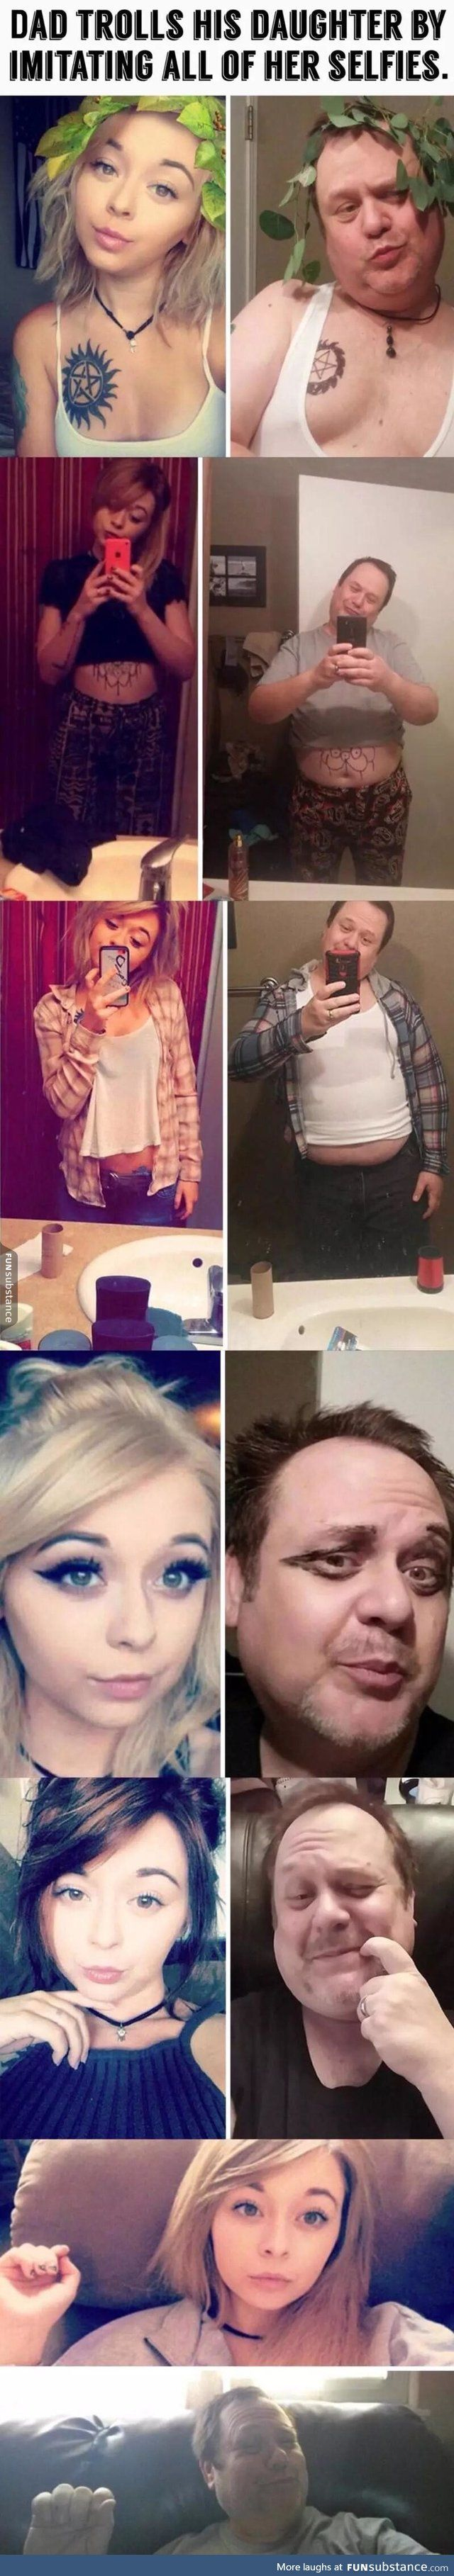 Dad imitates daughter's selfies